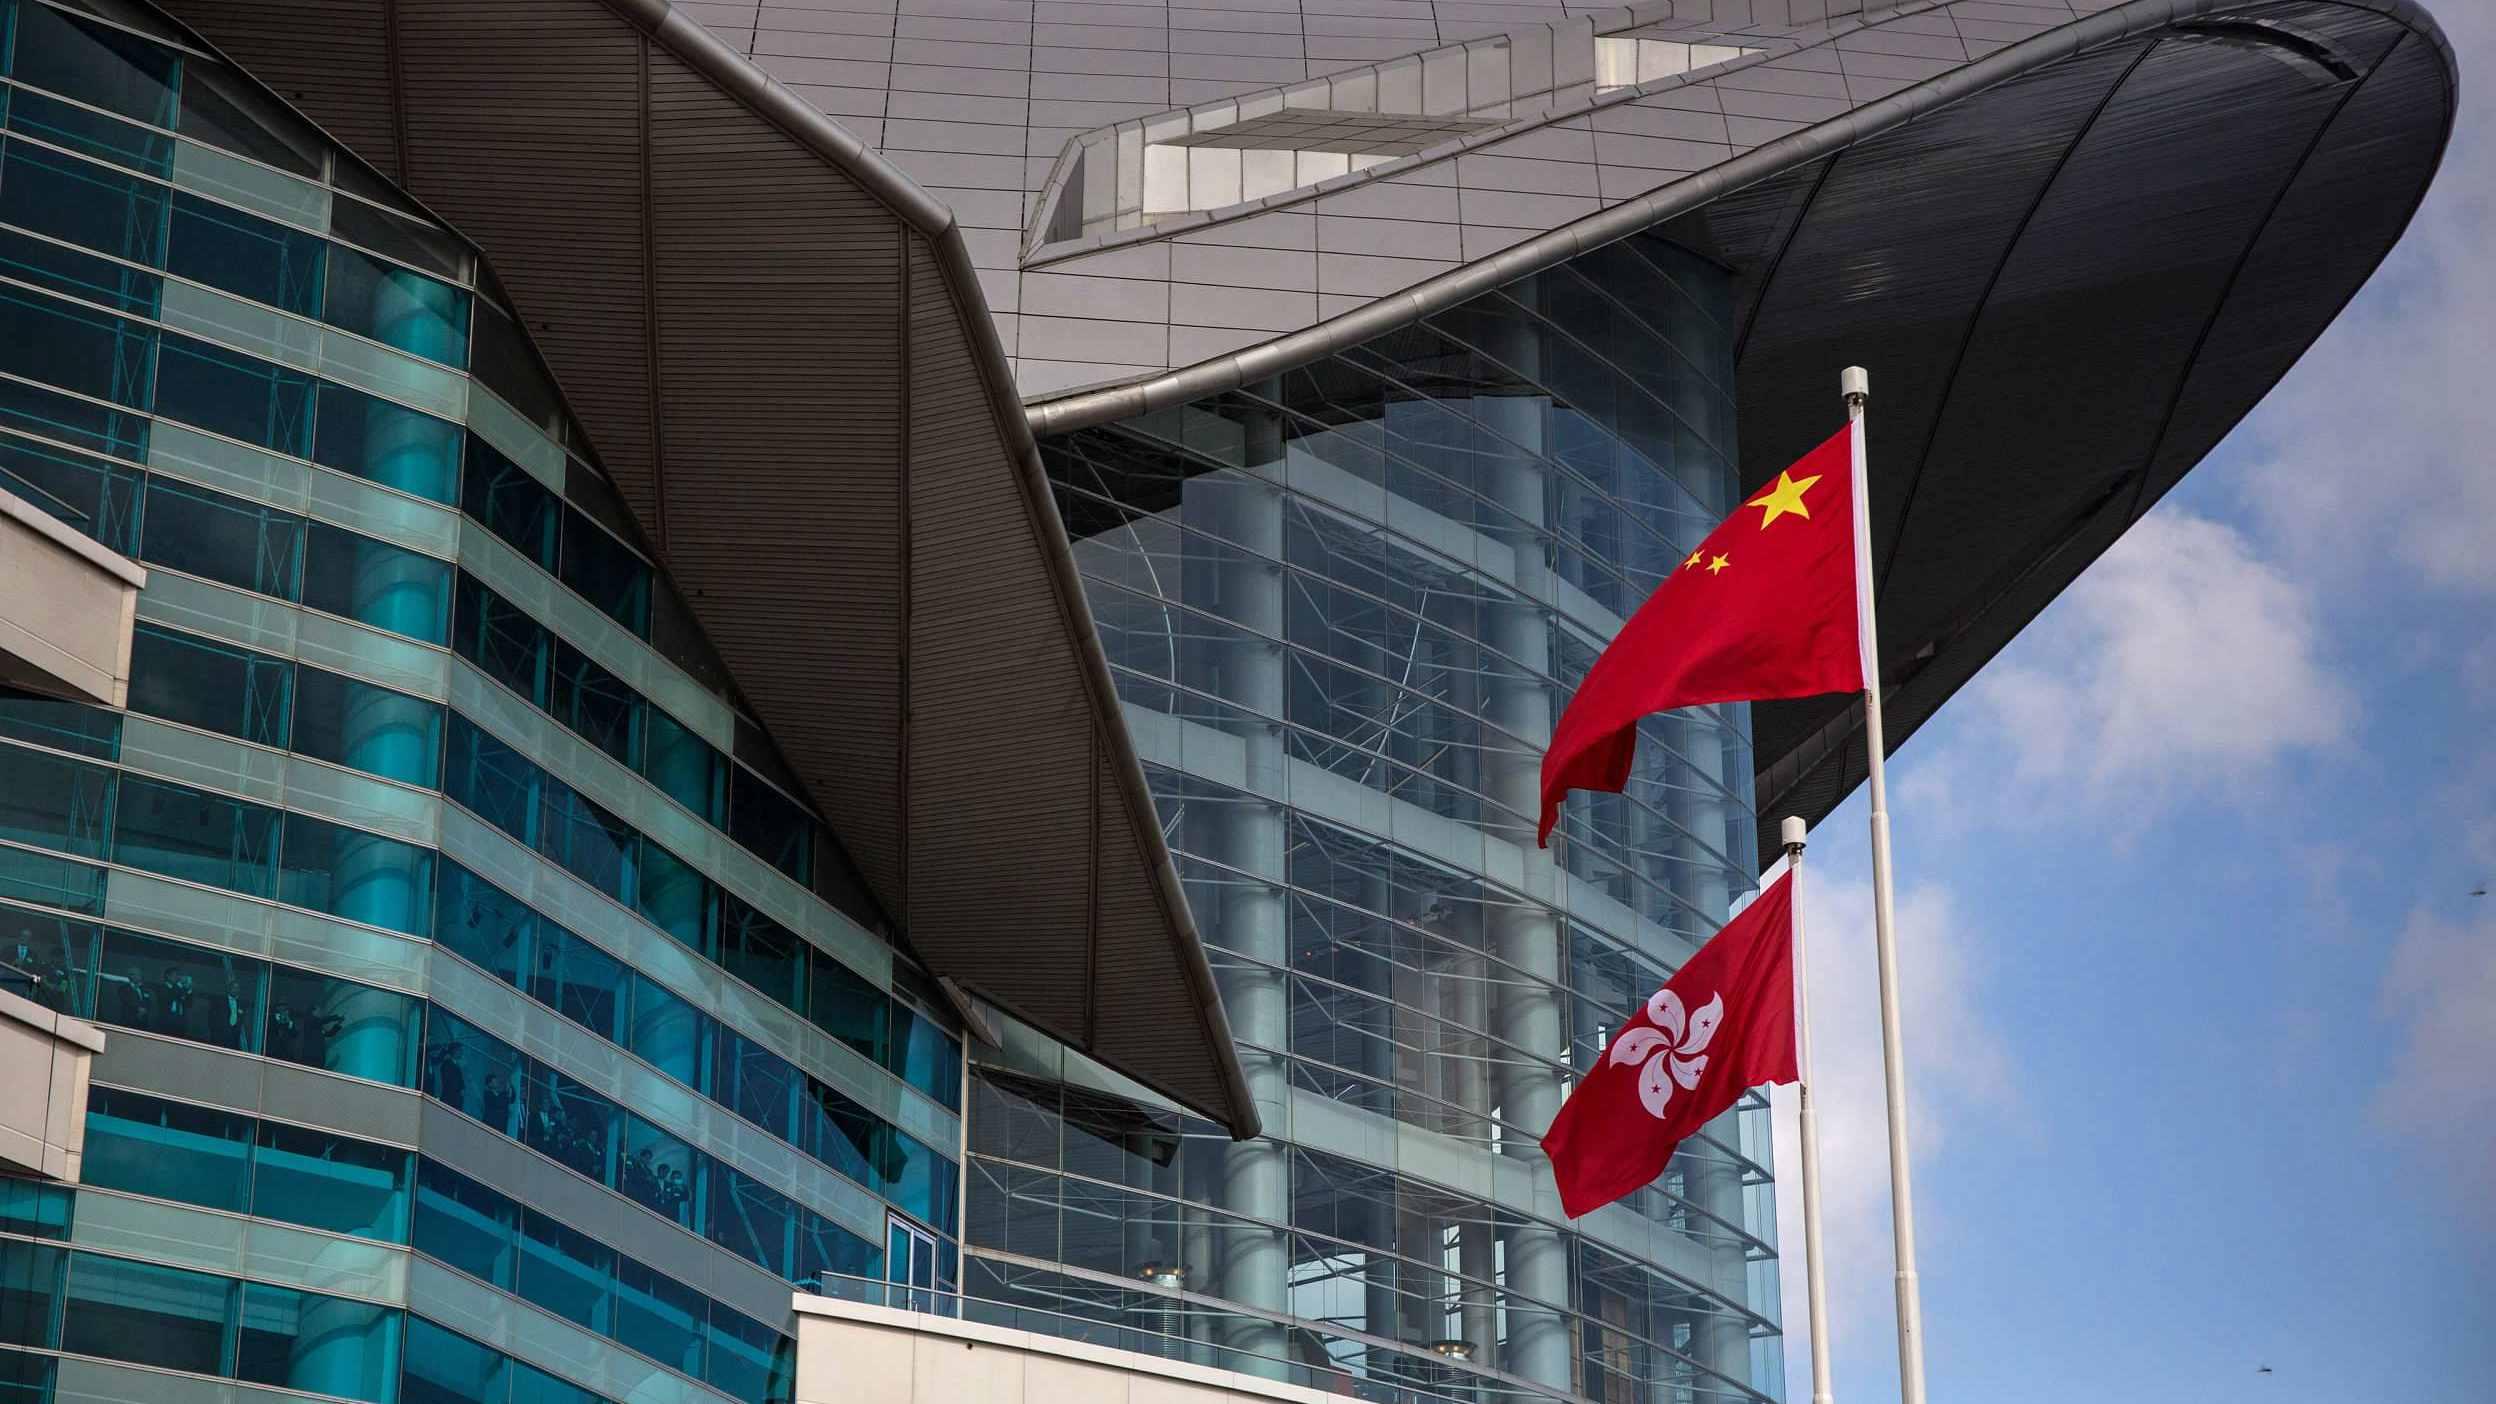 China slams 'Five Eyes alliance' for politicizing HK election delay